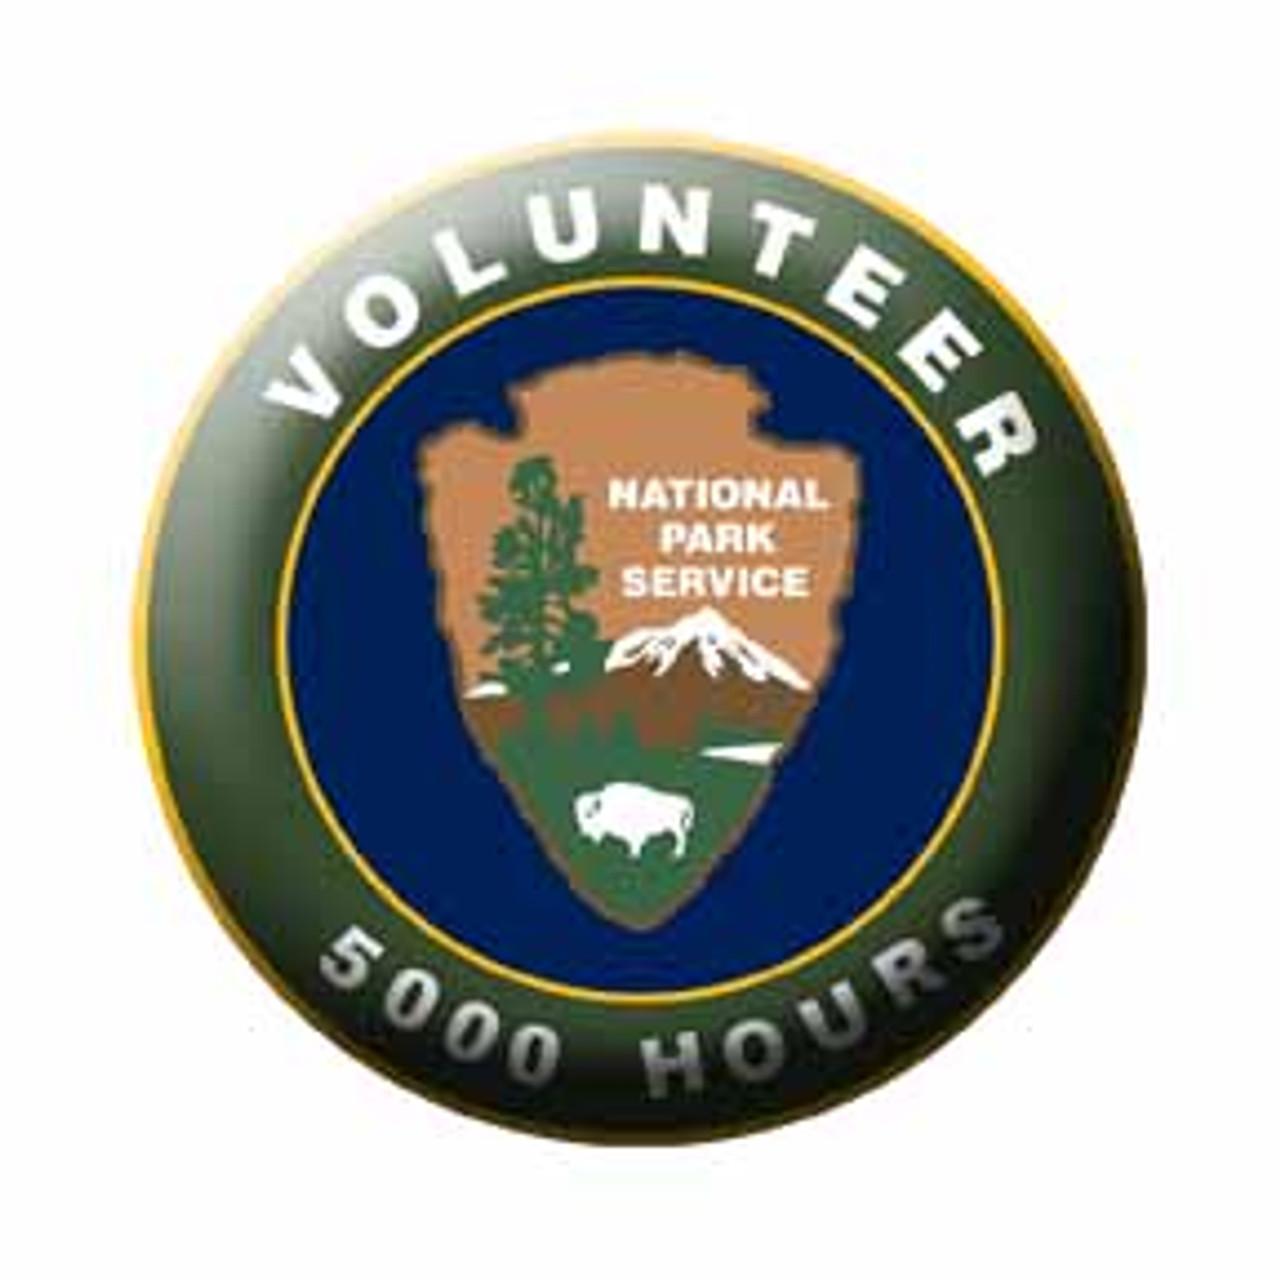 National Park Service Volunteer Hour Pins (3500 hours)